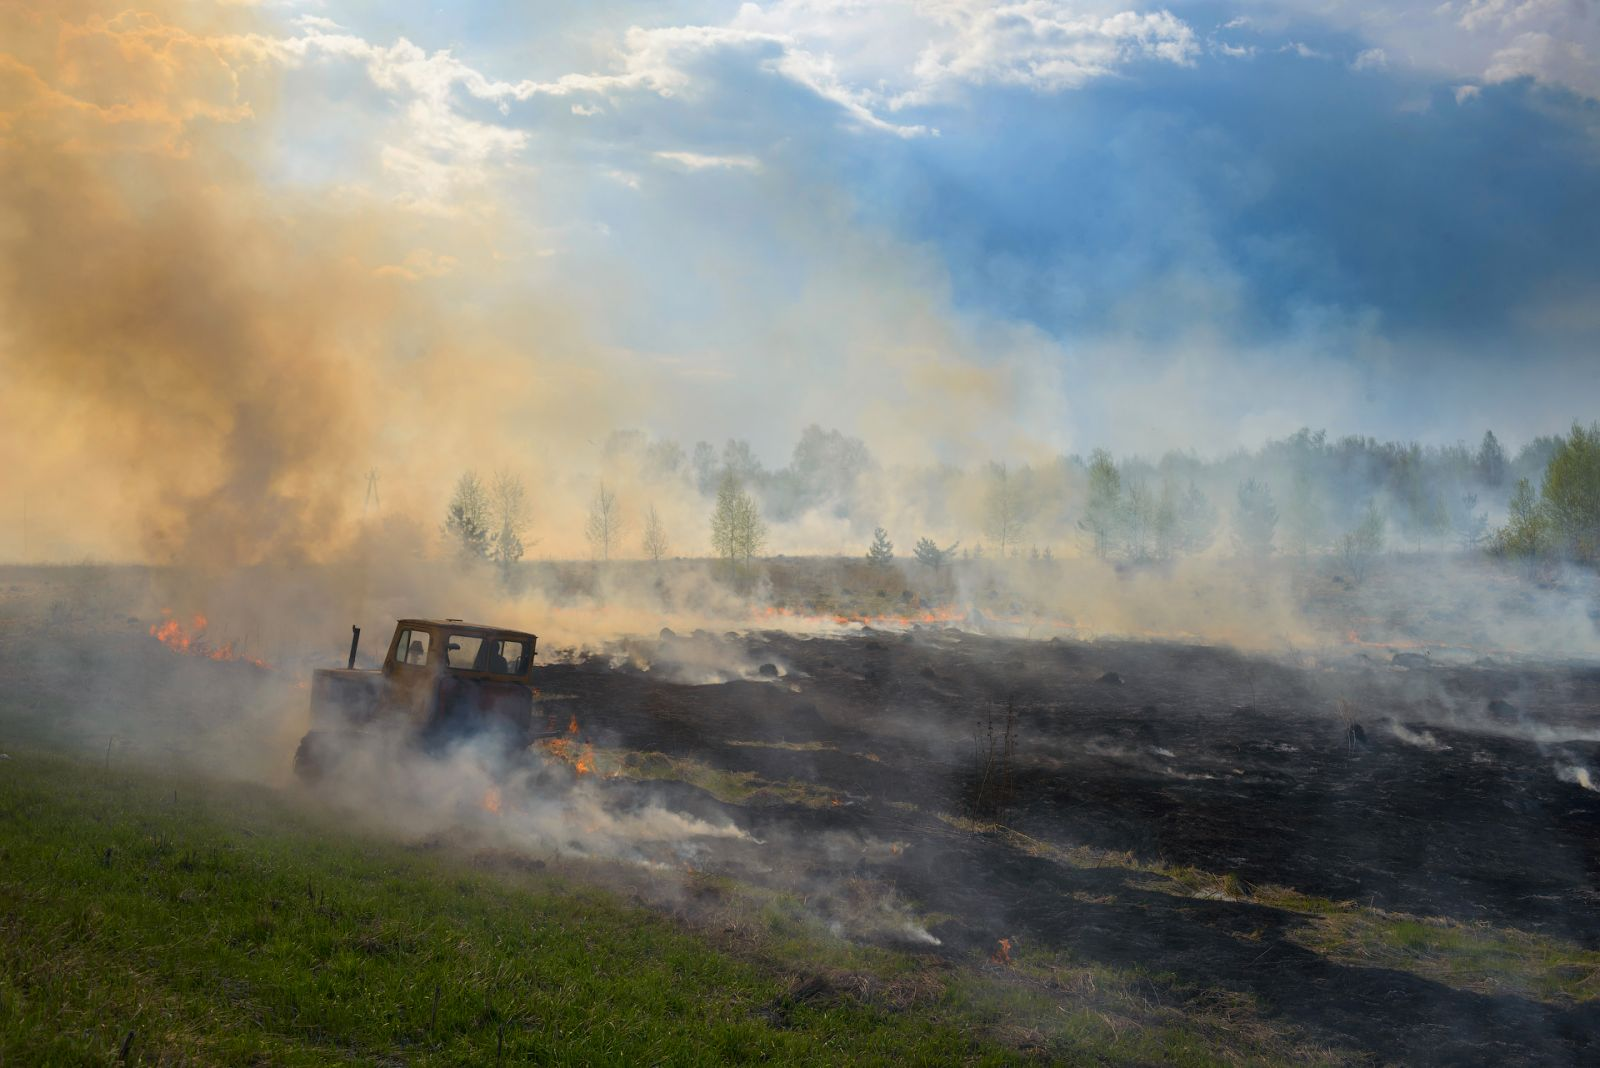 Огнеборец, © Эдуард Кутыгин, Финалист фотоконкурса «Самая красивая страна – 2018»